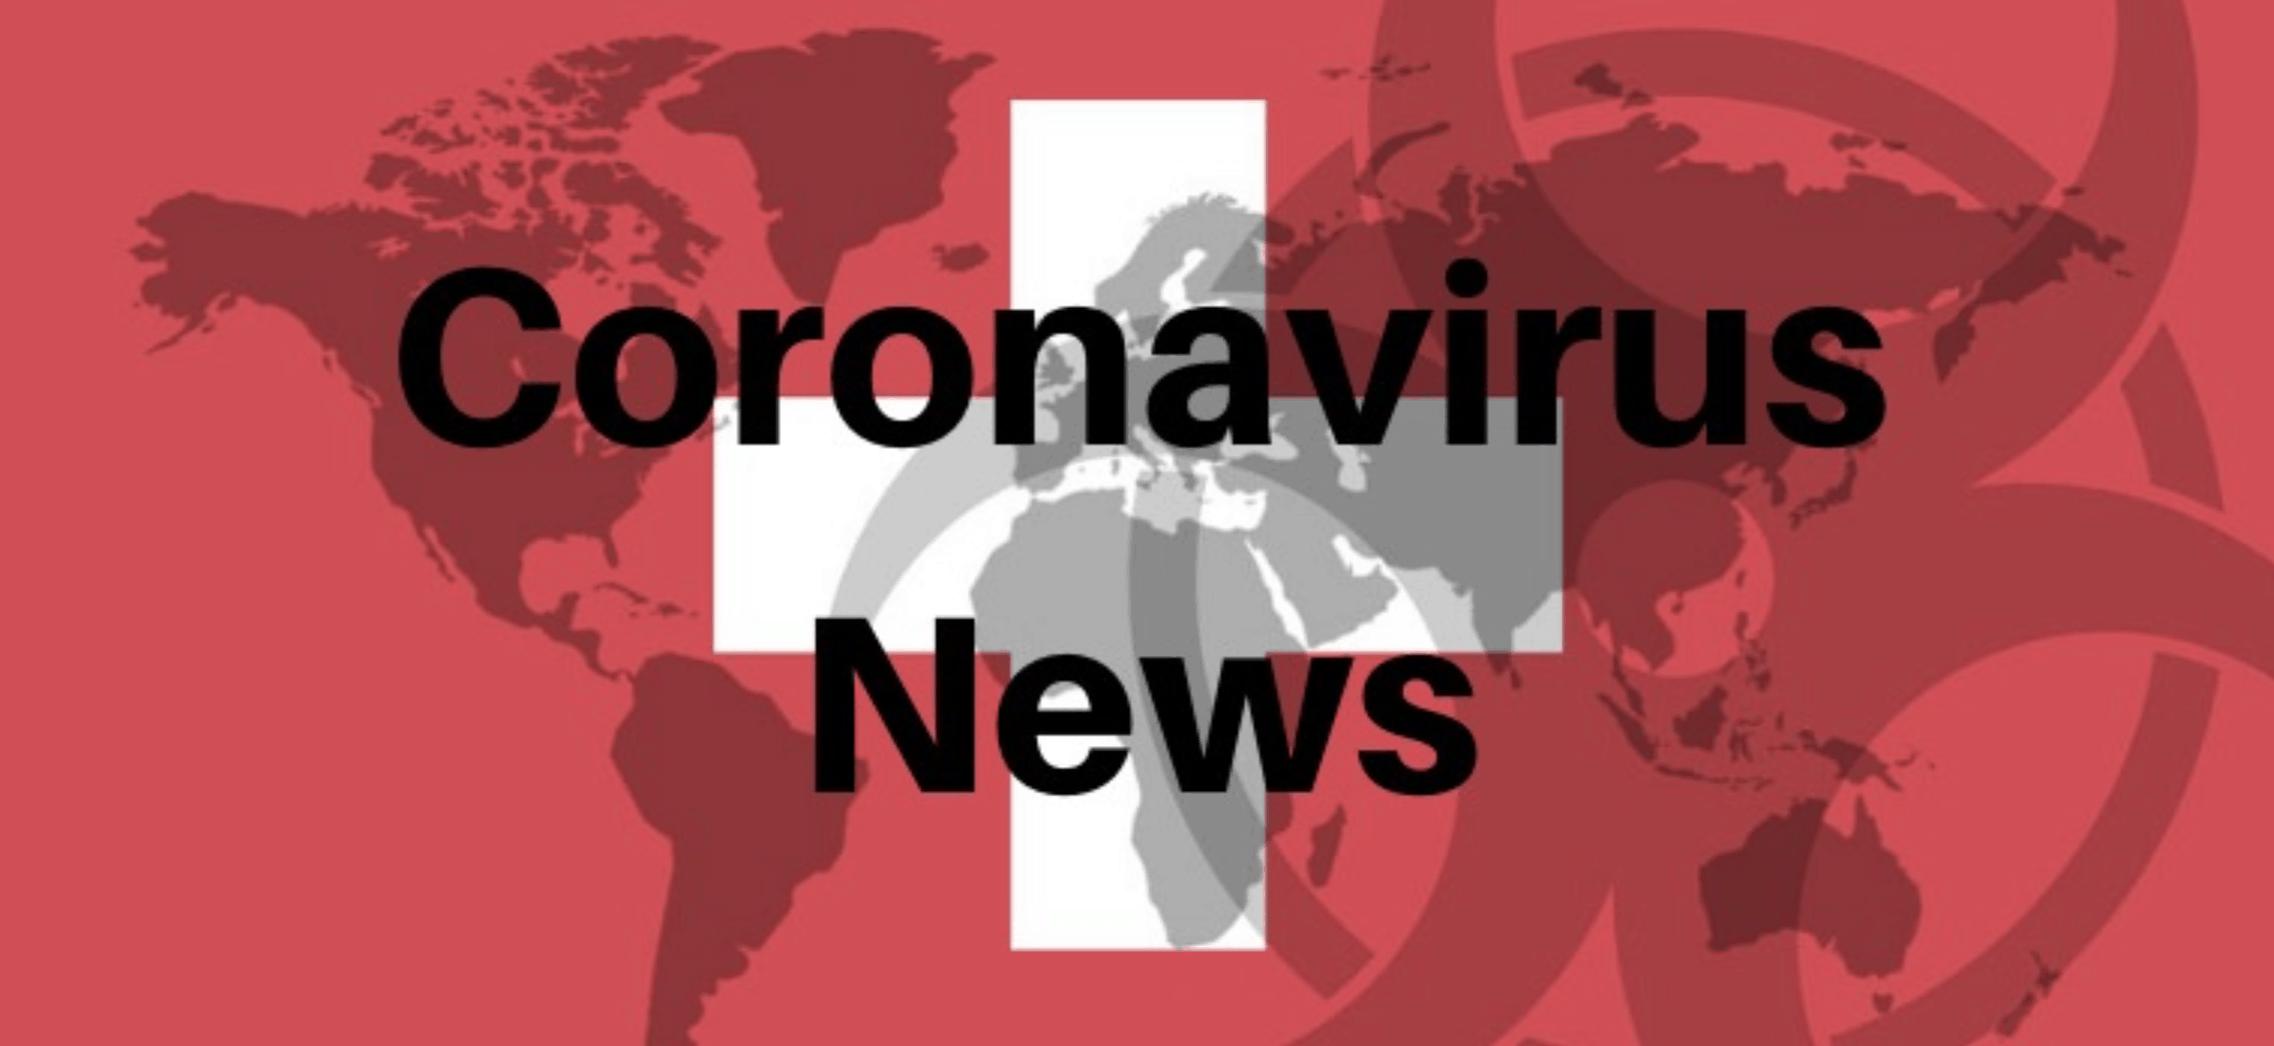 New coronavirus: Recommendations for travellers